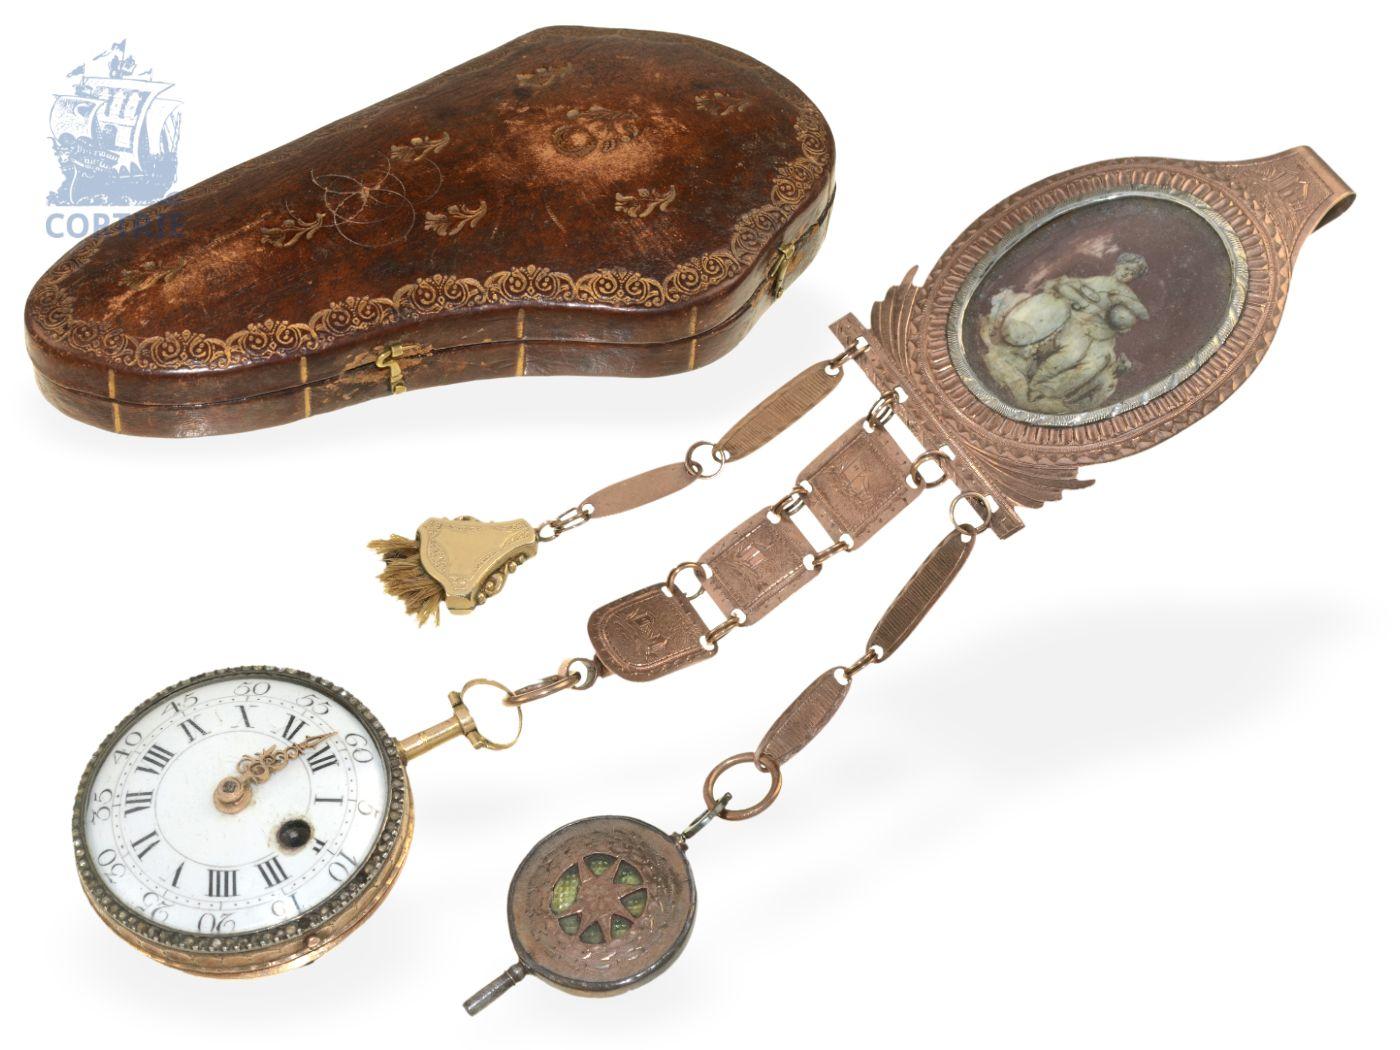 Pocket watch: rare verge watch, ca. 1760, with original chatelaine and original box-